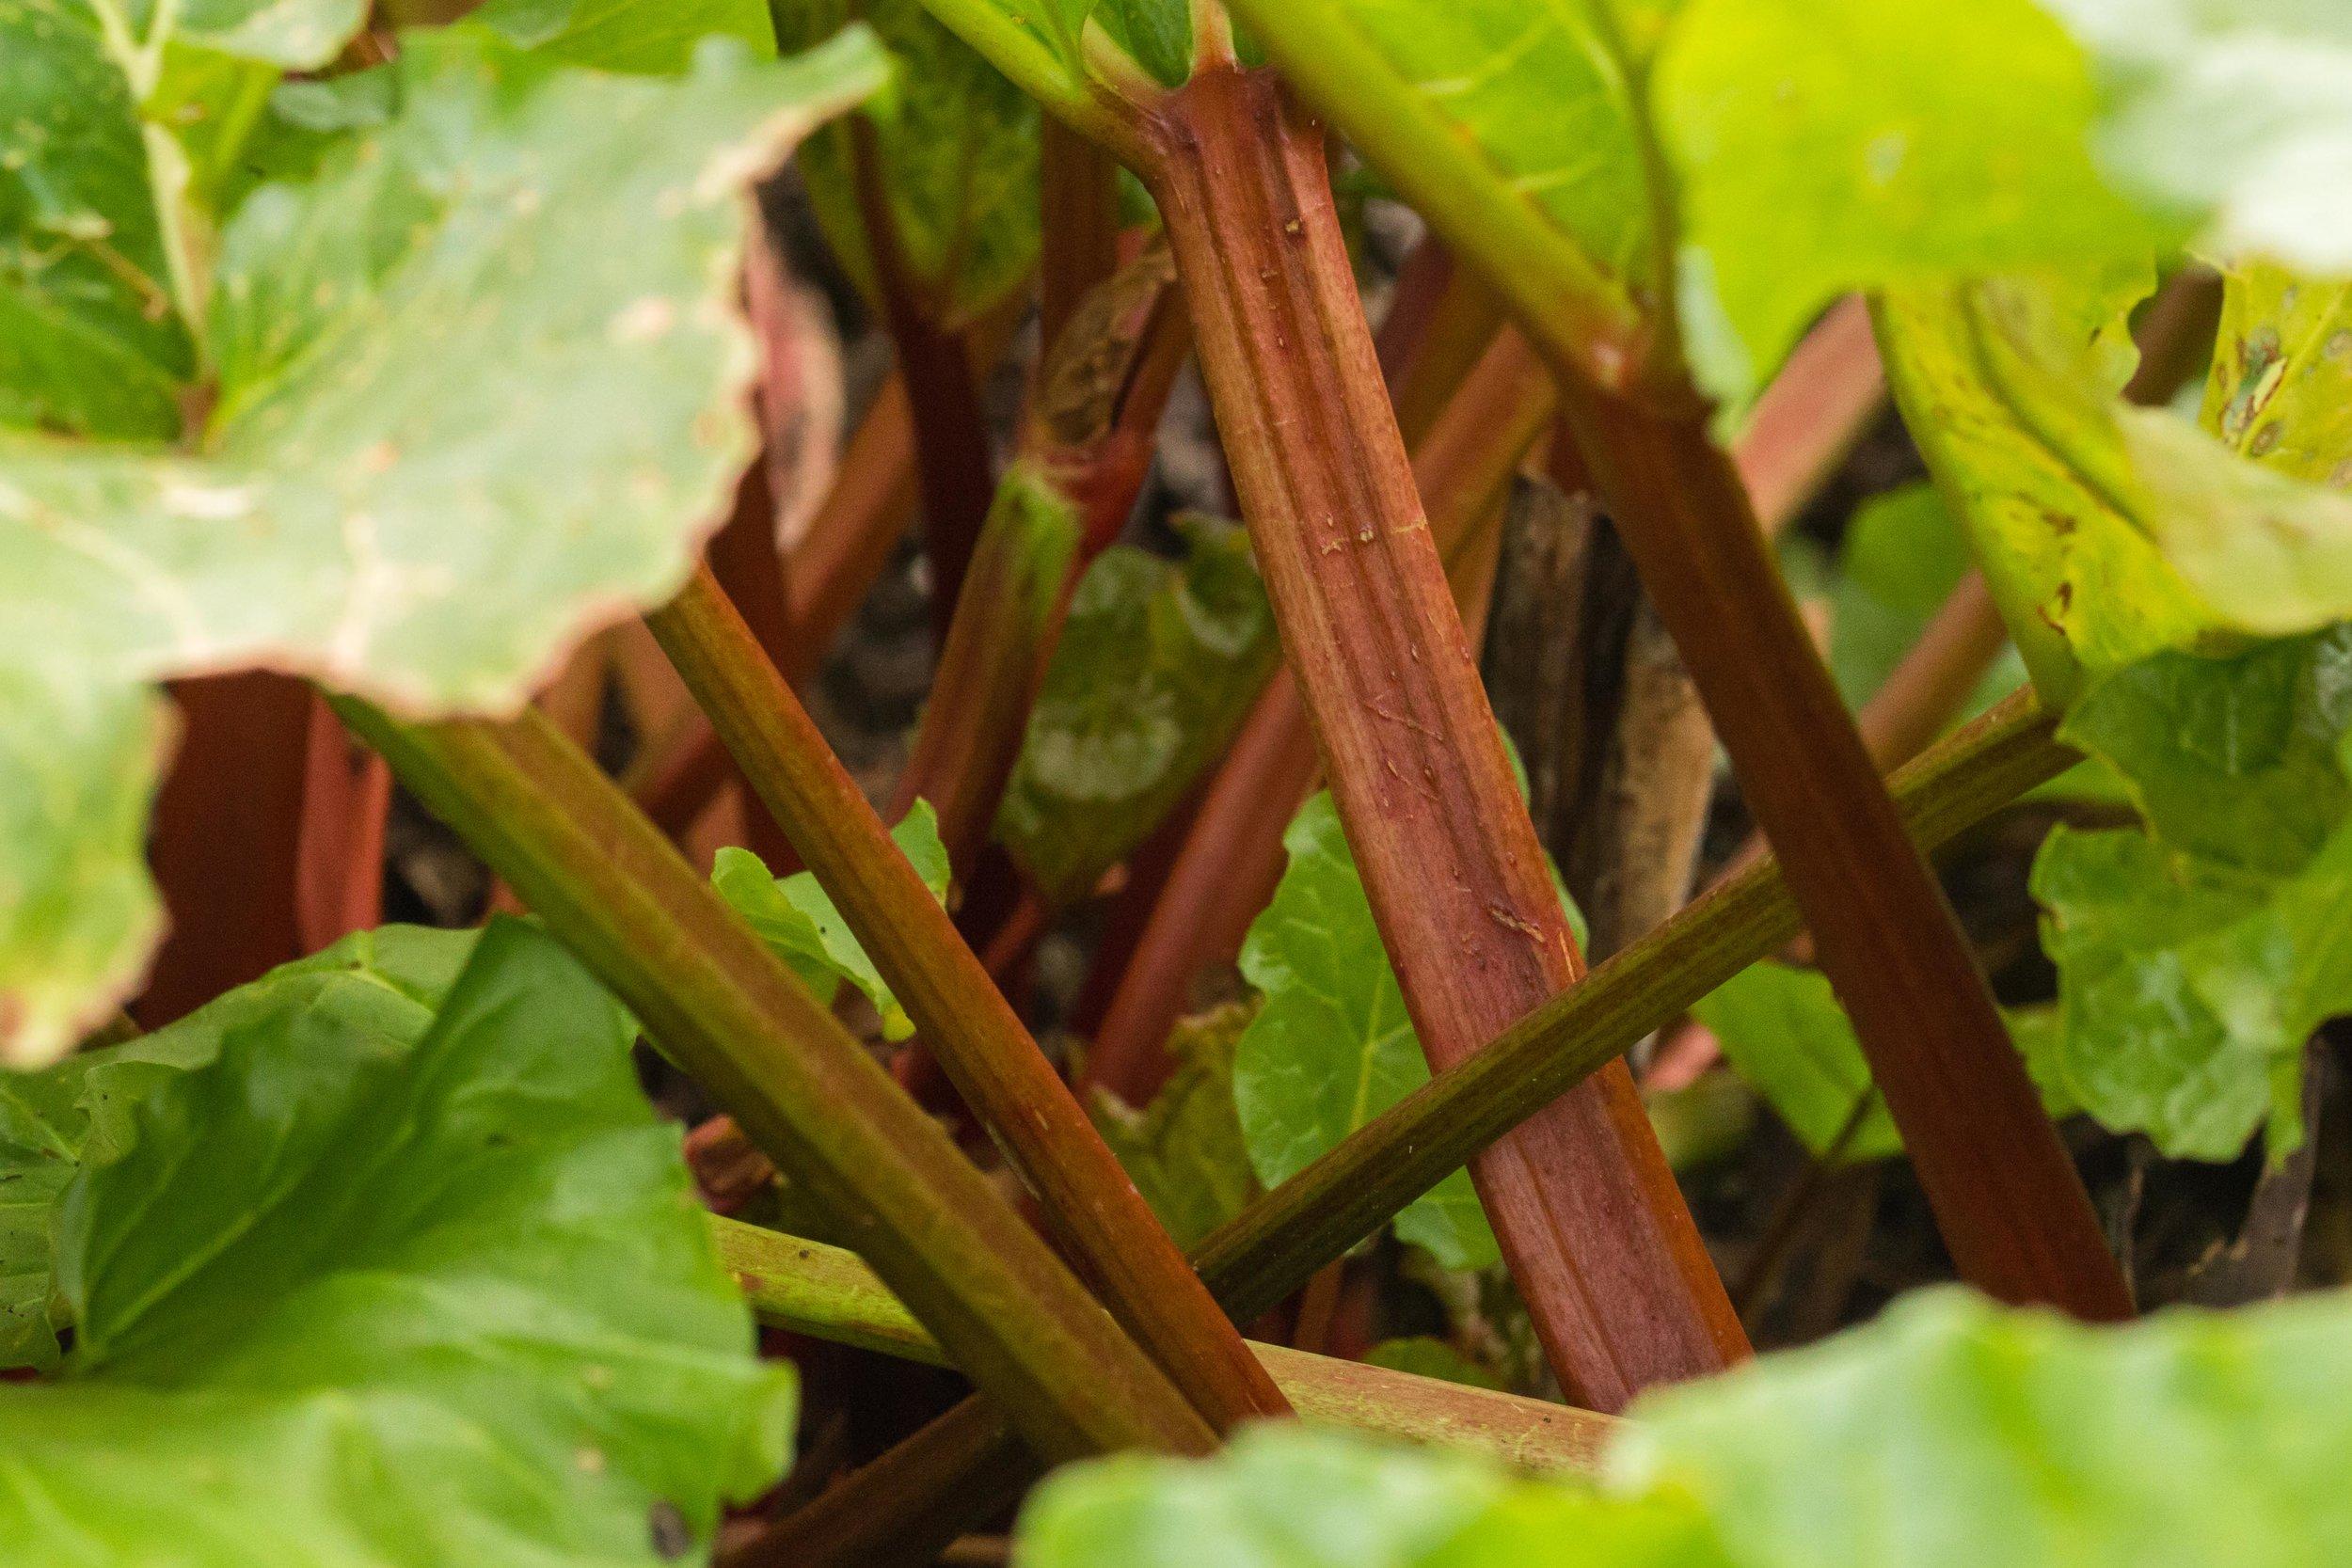 TePunaTaiao-HamiltonGardens(veg)-Highres-7390.jpg